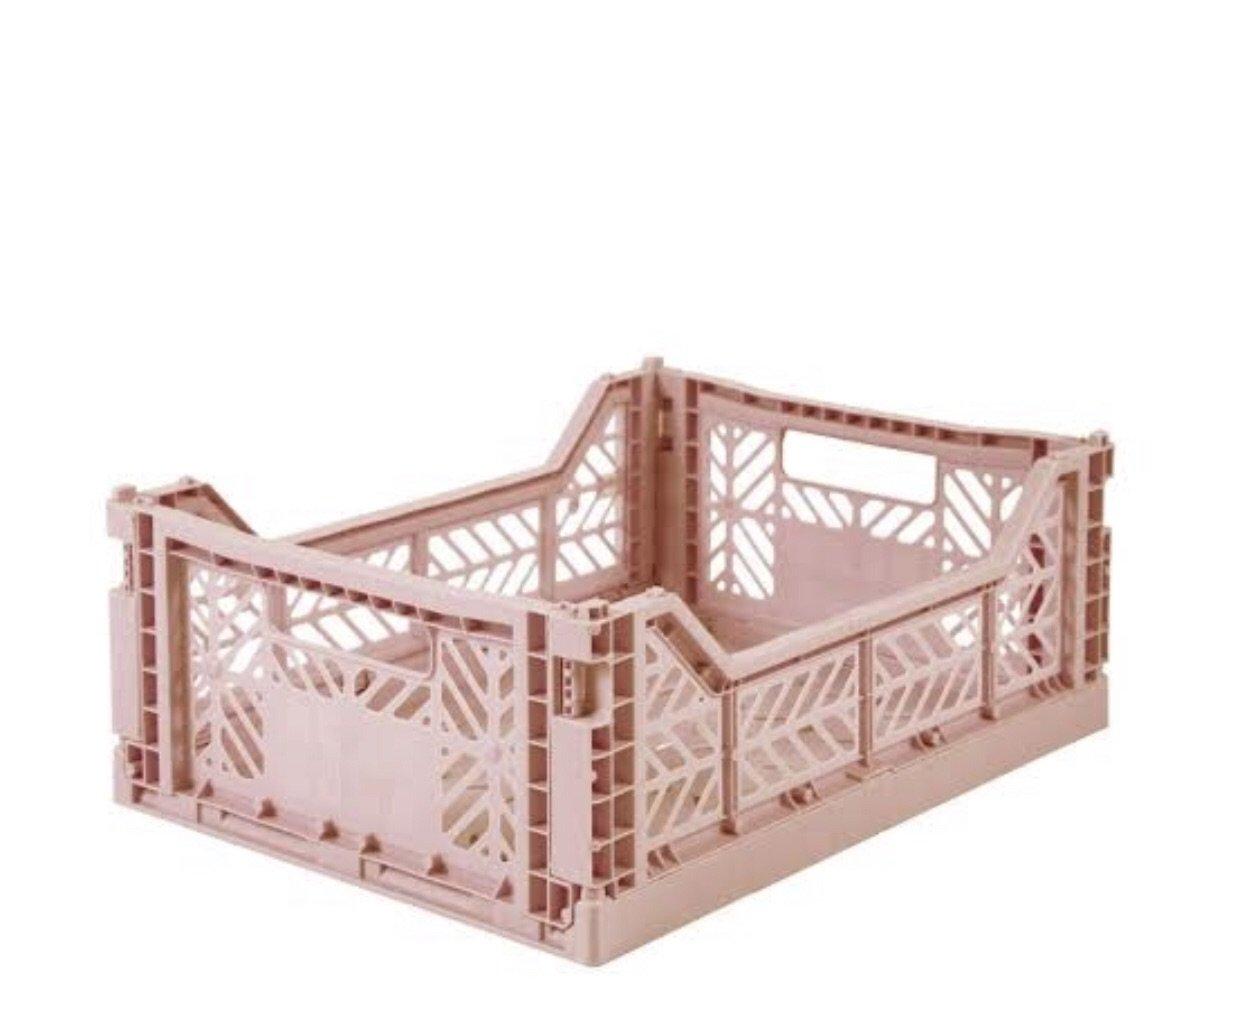 Ay-Kasa Folding Crate  $24.99